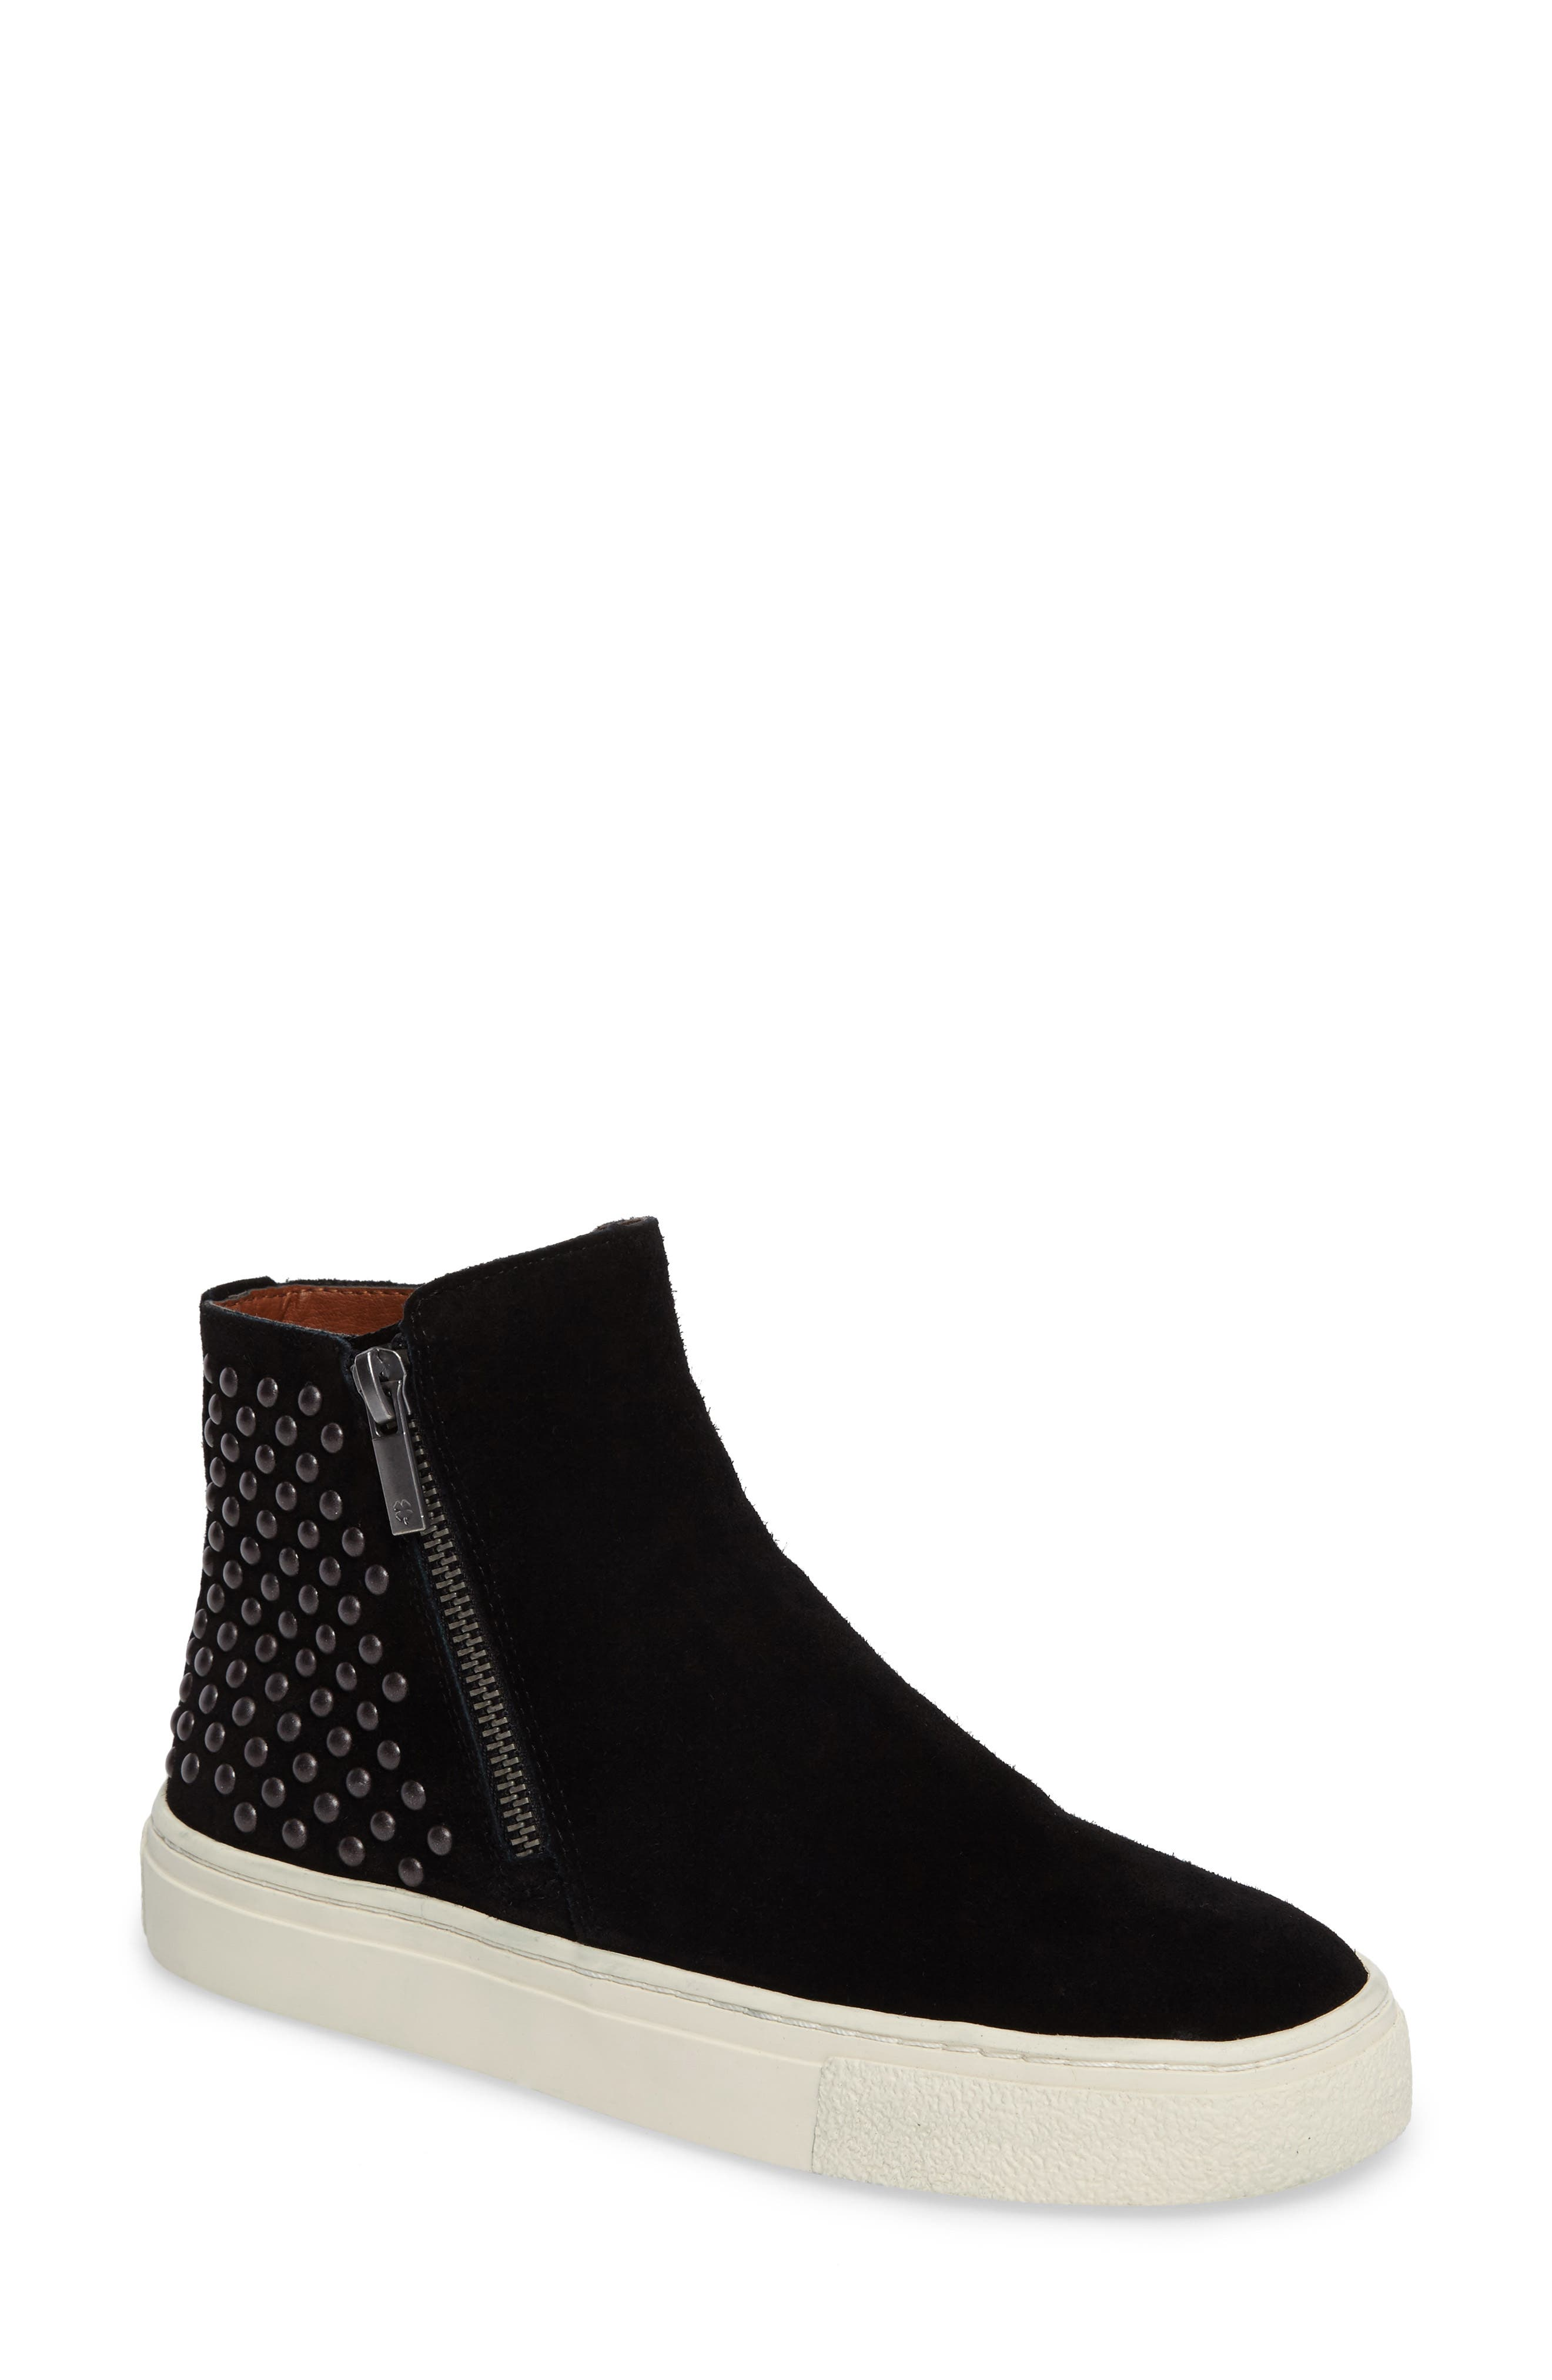 Bayleah High Top Sneaker,                             Main thumbnail 1, color,                             001